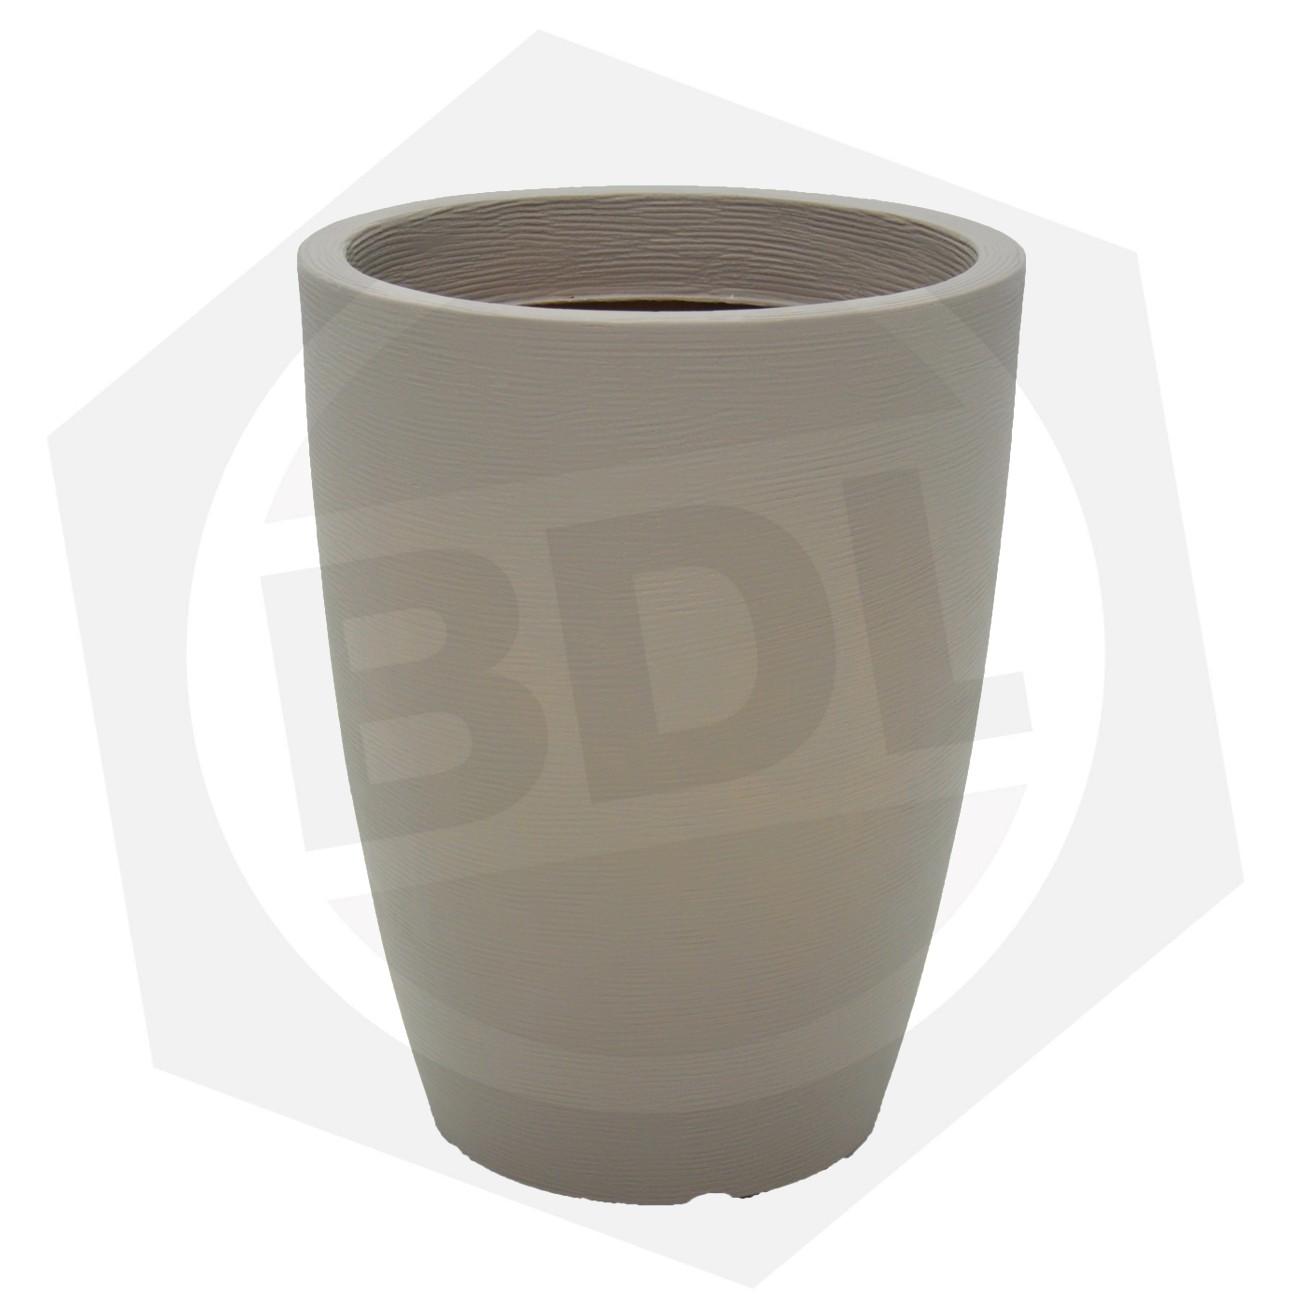 Maceta Plástica THAI Tramontina 92793/210 - 58 cm / CONCRETO